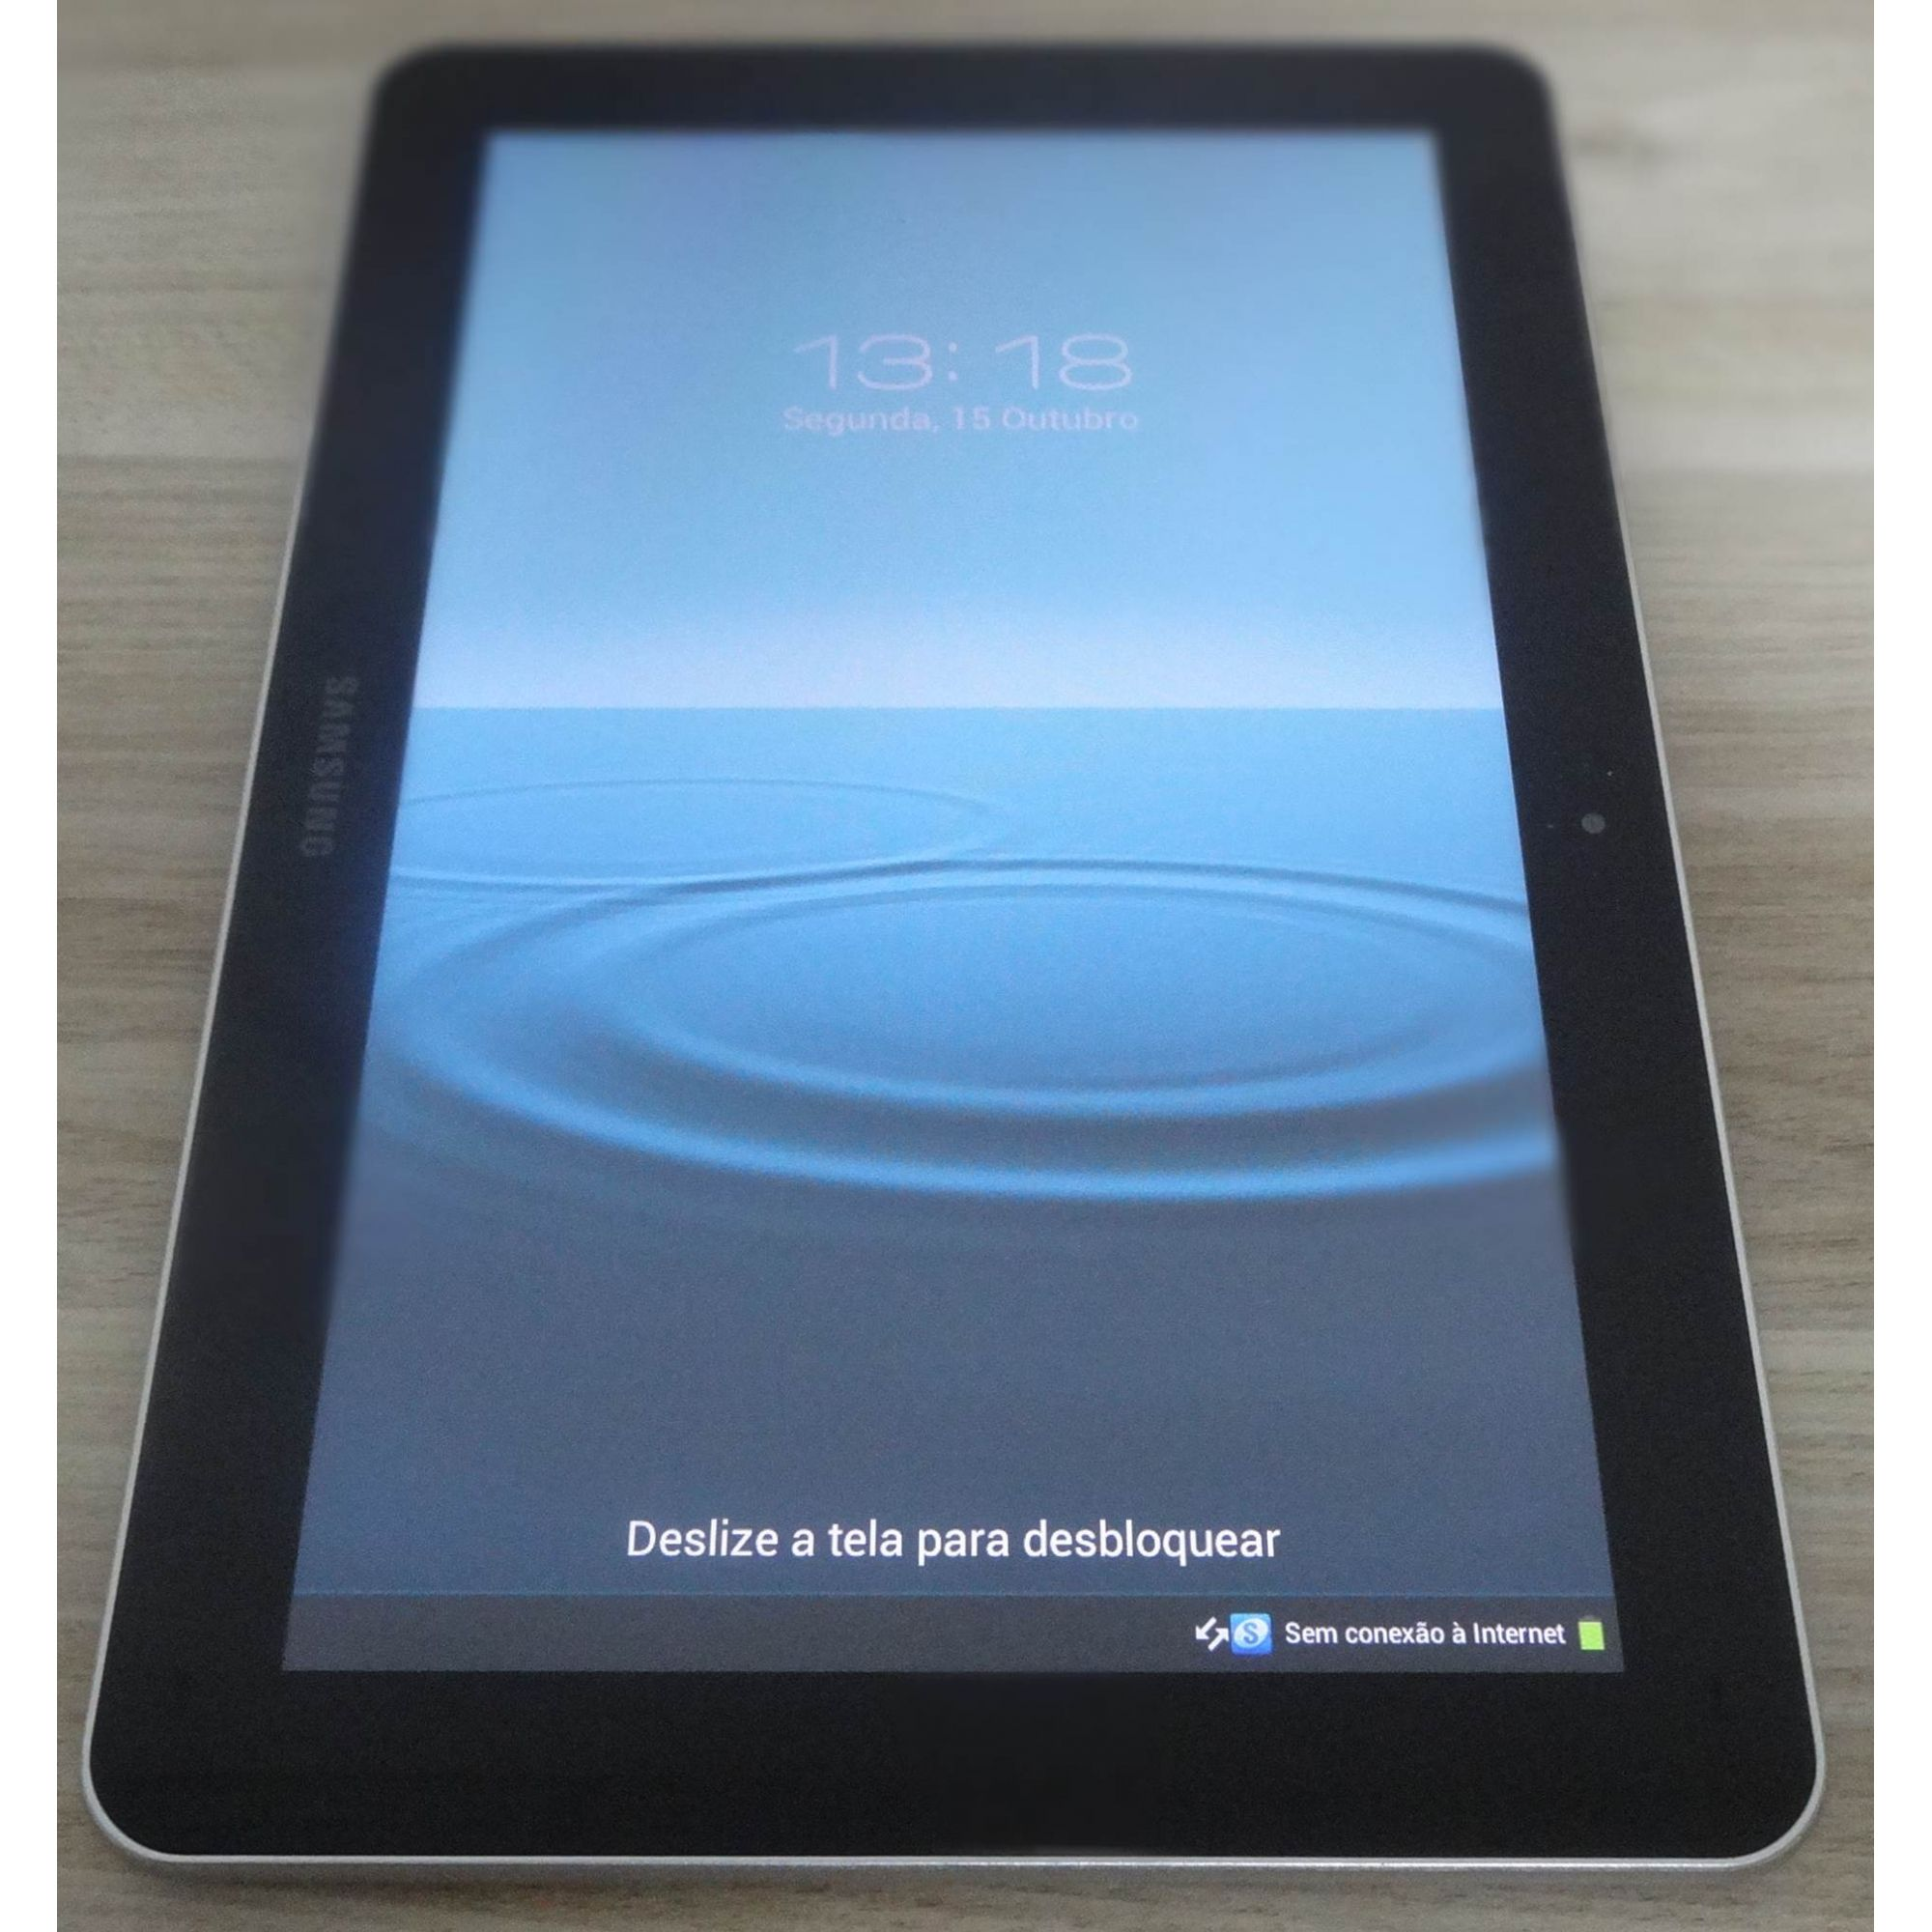 "Tablet Samsung Galaxy GT-P7510 10.1"" Wi-Fi Dual Core 1.0GHz 16GB Câmera Frontal 2.0MP"